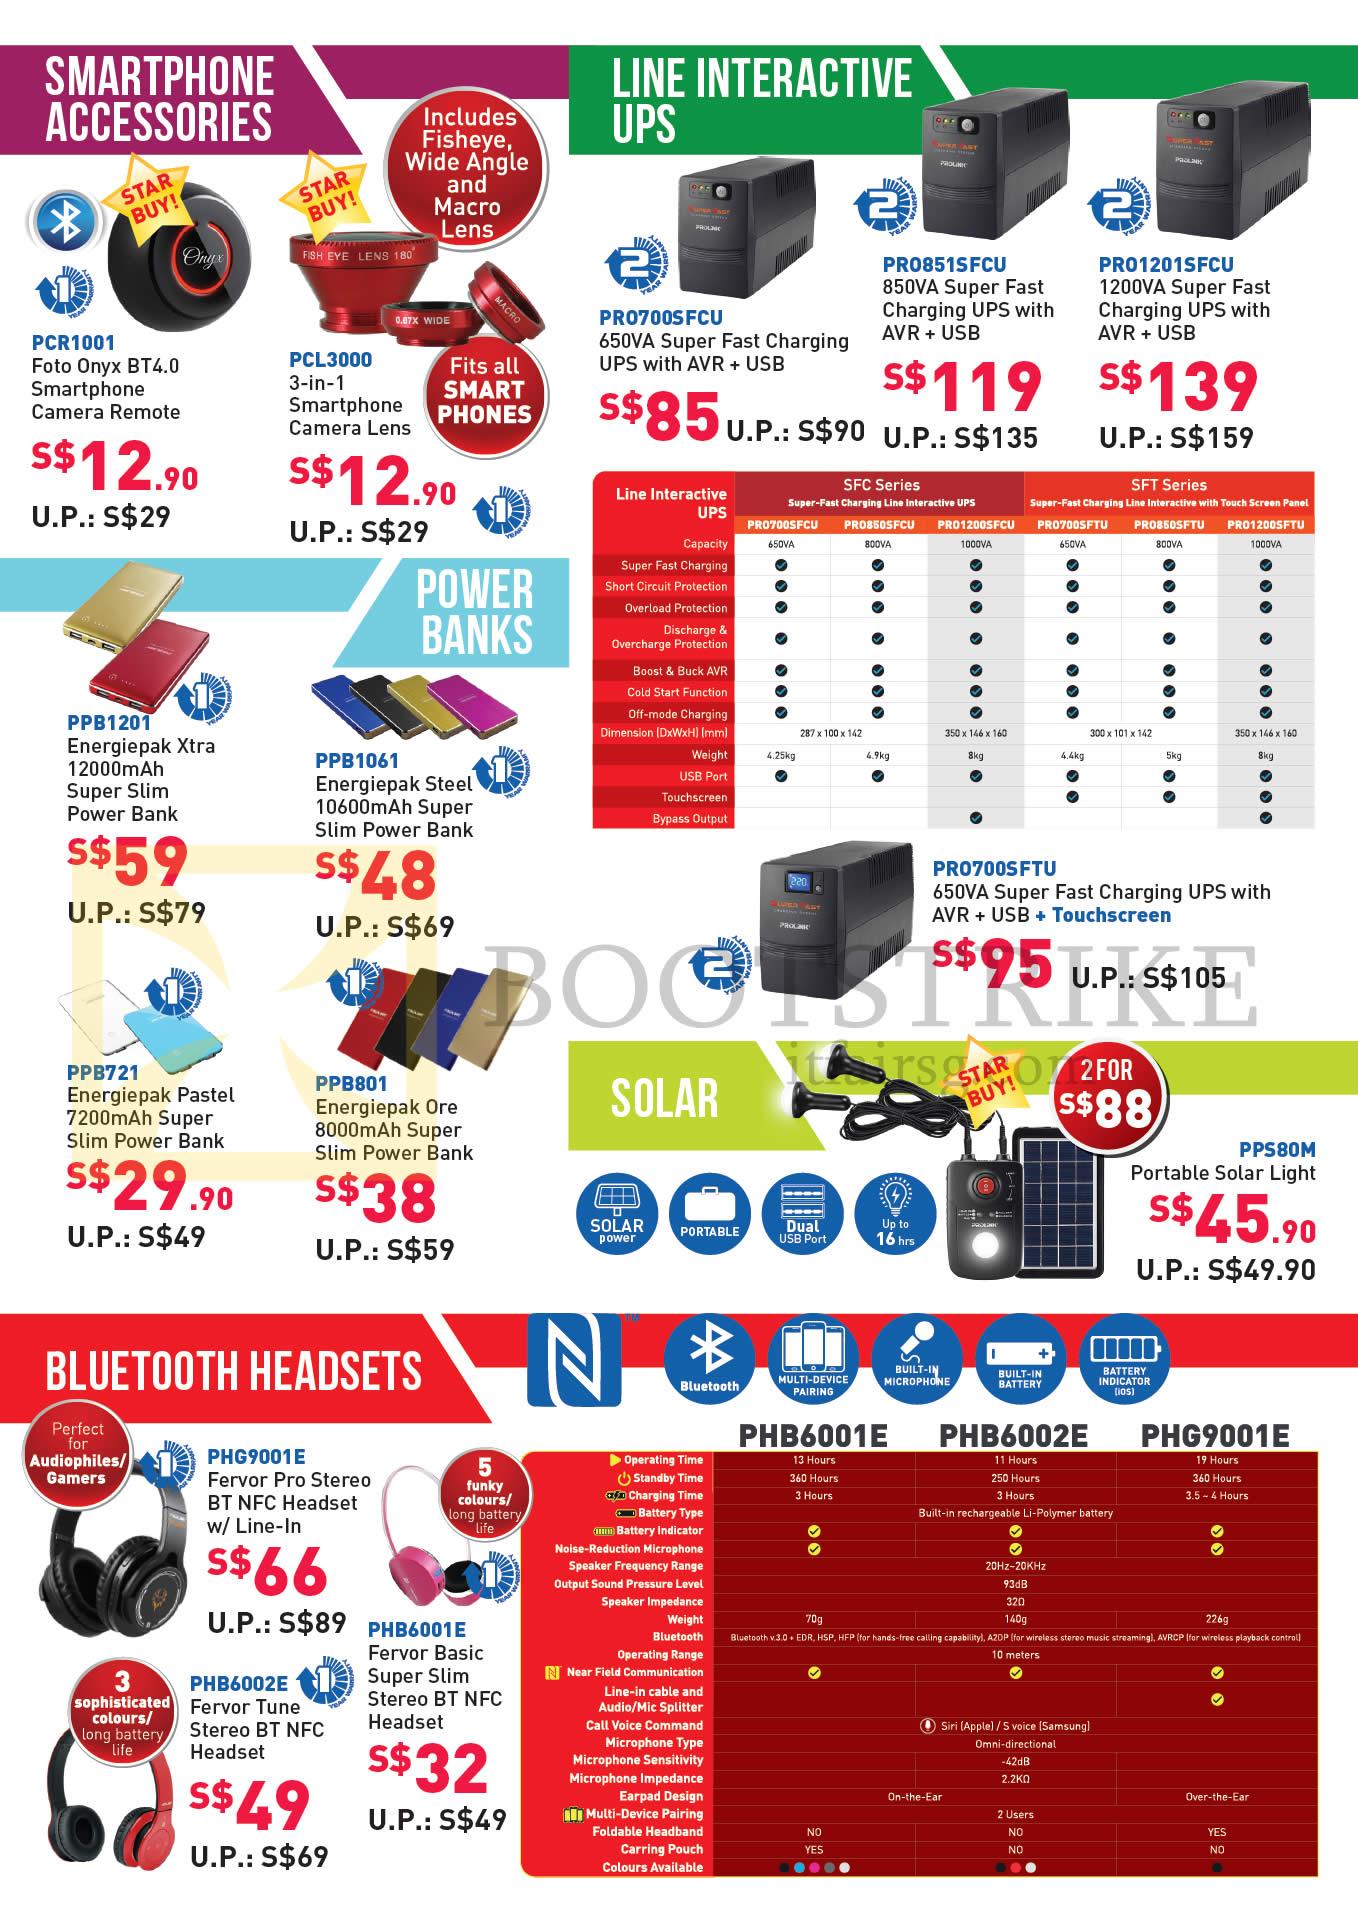 COMEX 2016 price list image brochure of Prolink Smartphone Accessories, Line Interactive UPS, Power Banks, Bluetooth Headsets, PCR1001, PCL3000, PRO7005FCU, PRO8515FCU, PRO12015FCU, PPB1201